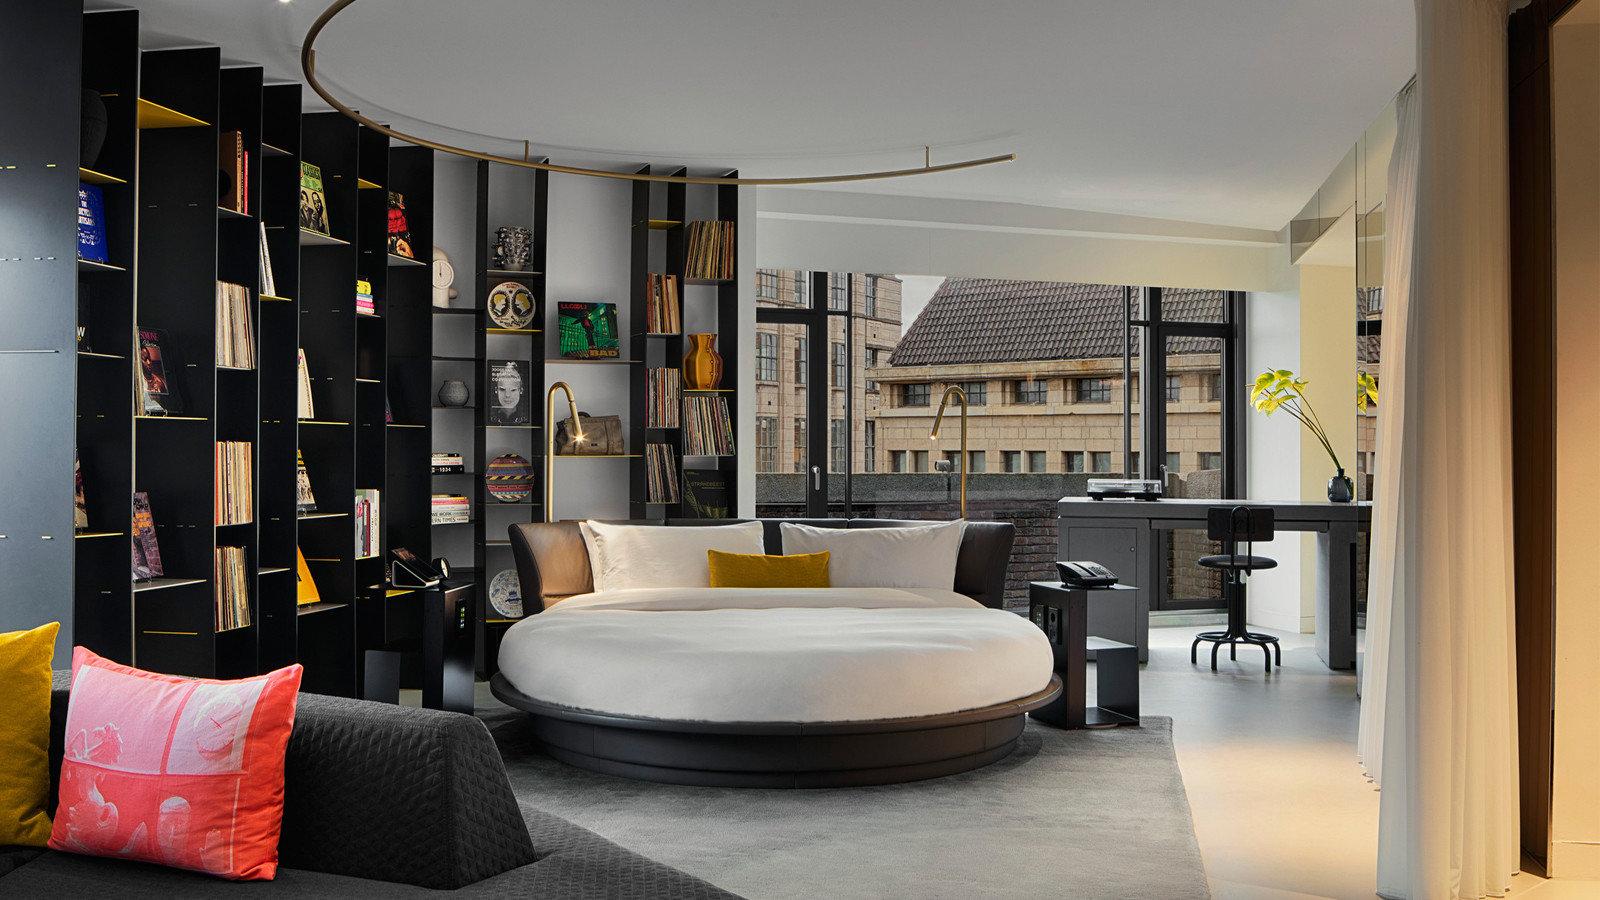 Amsterdam Hotels The Netherlands indoor floor room interior design furniture ceiling interior designer living room Suite loft